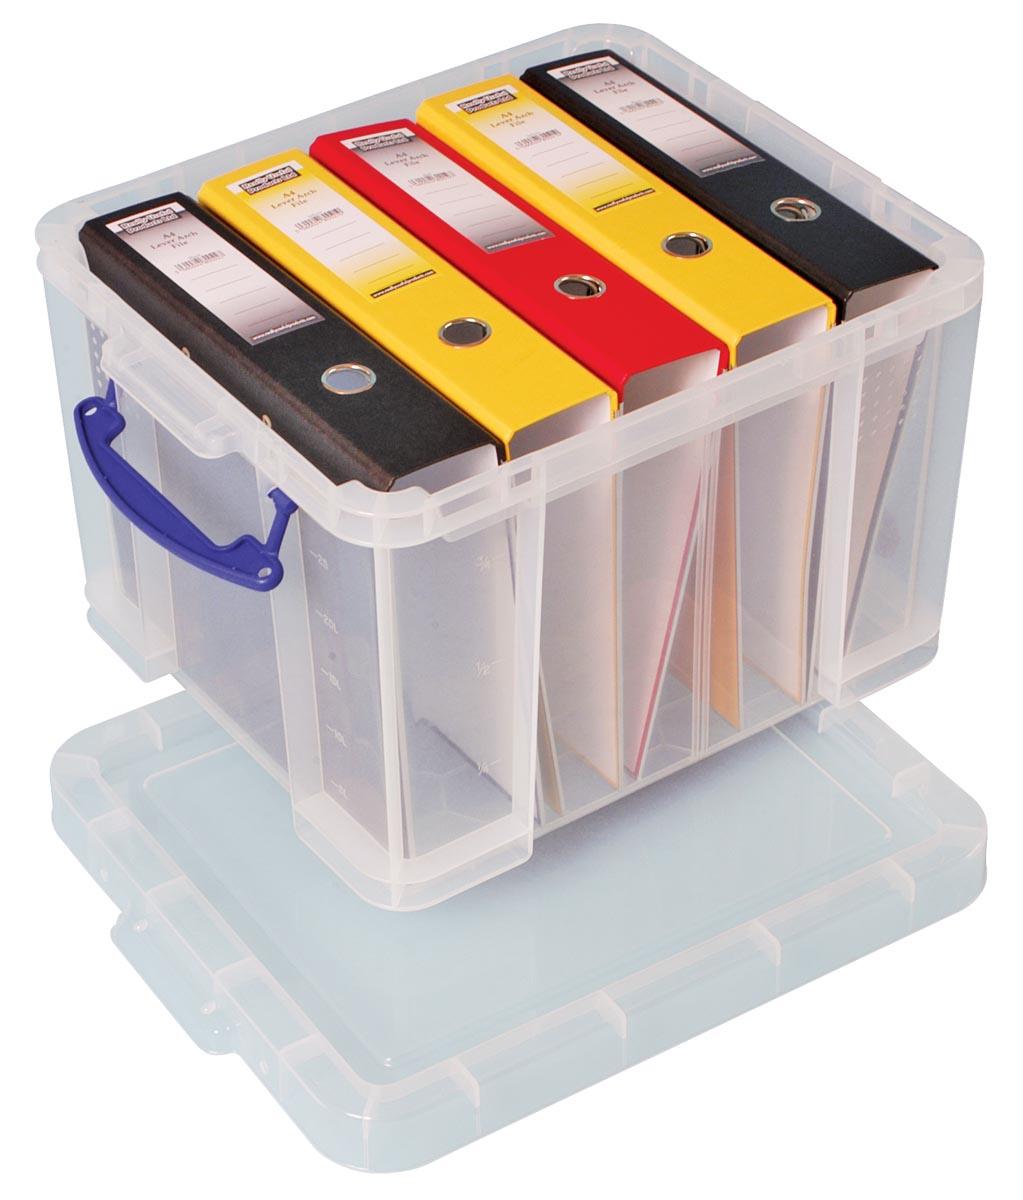 Really Useful Boxes Archiefboxen Transparant Plastic Met deksel 48 x 39 x 31 cm Stuks